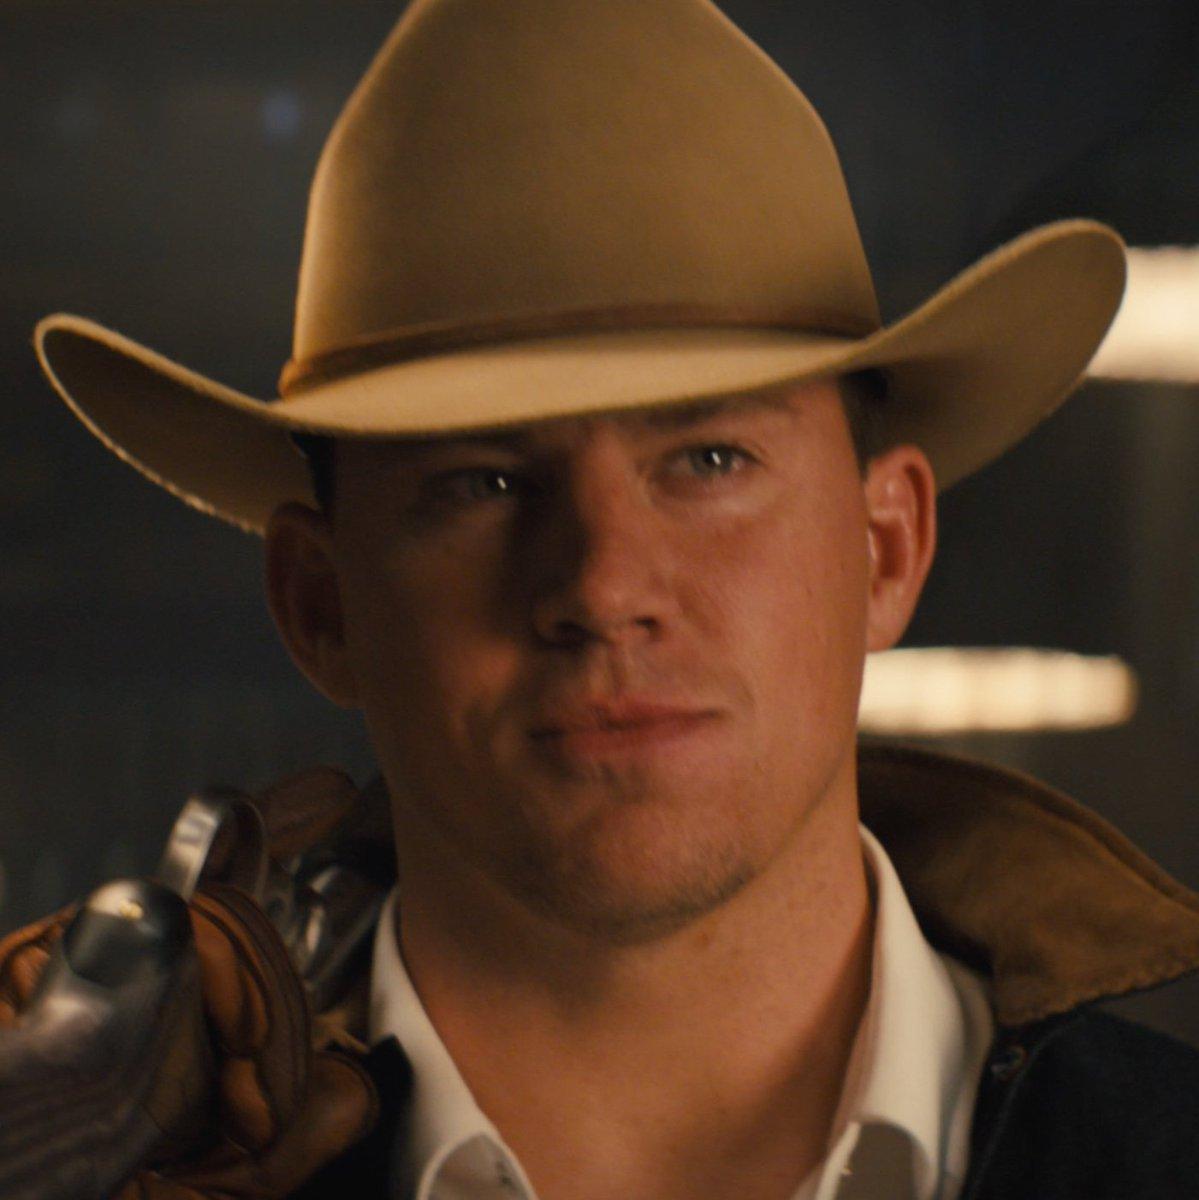 Channing Tatum | Conta... Channing Tatum